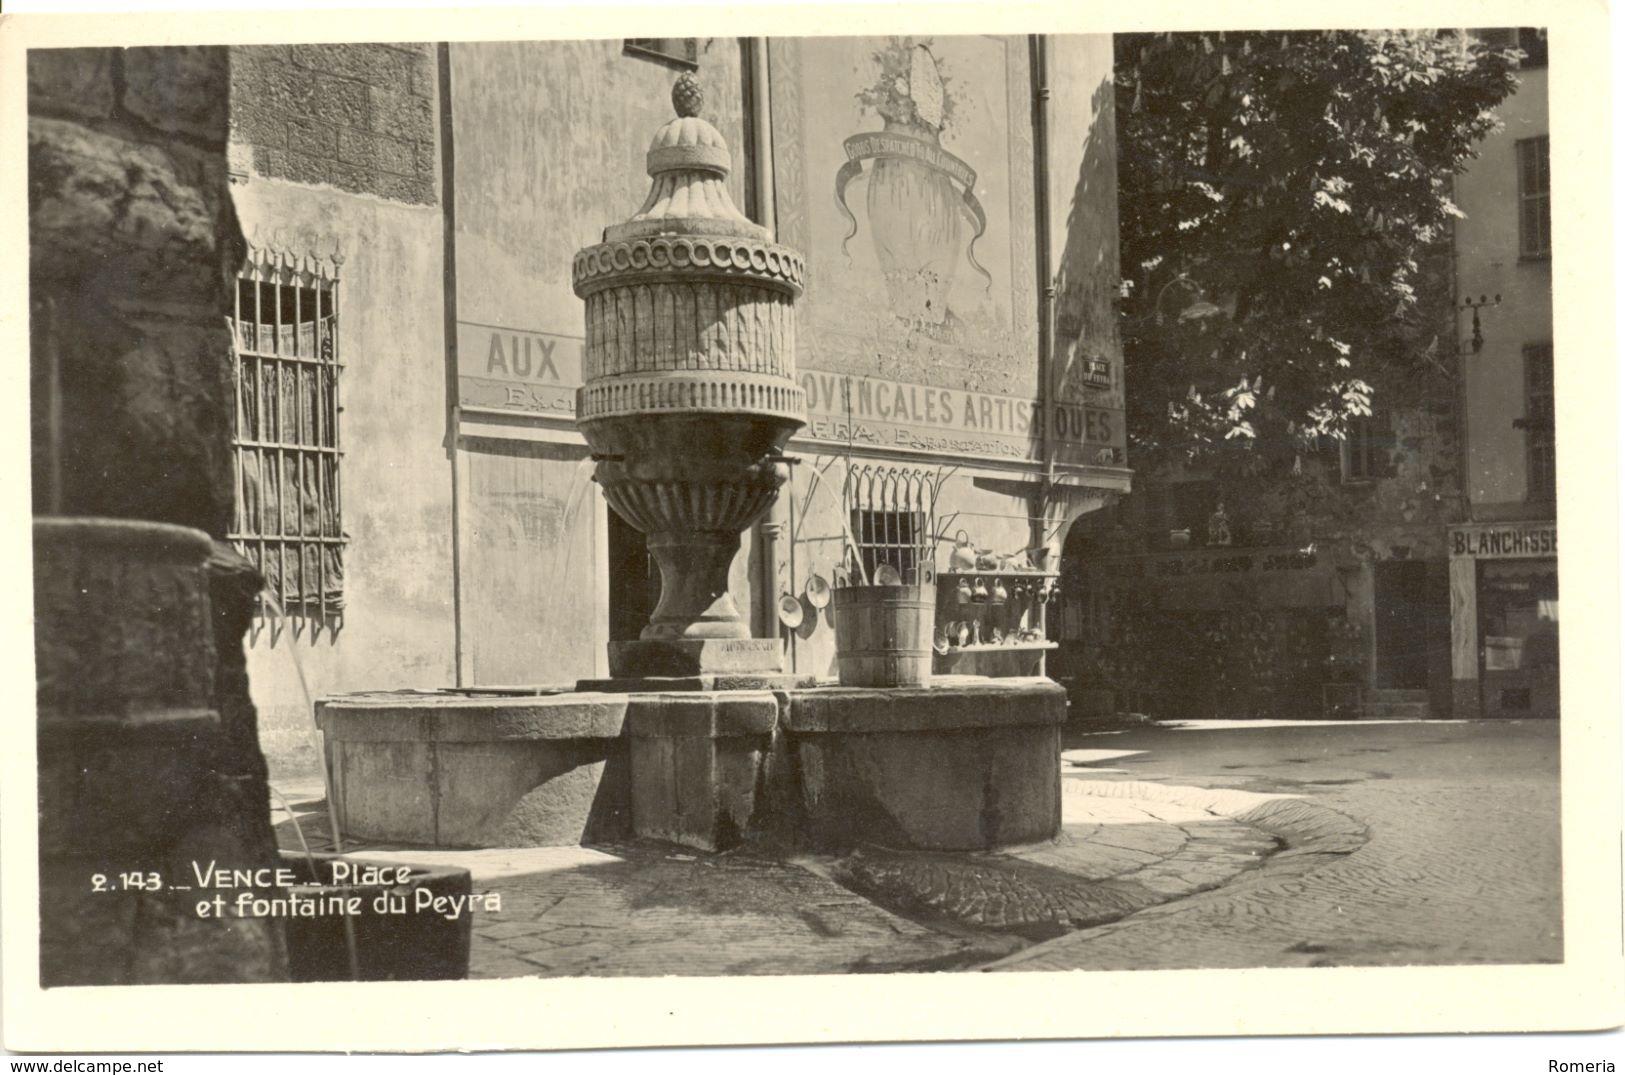 France - Alpes Maritimes - Vence - Place Et Fontaine Du Peyra - Cigogne Nº 2143 - 4969 - Vence